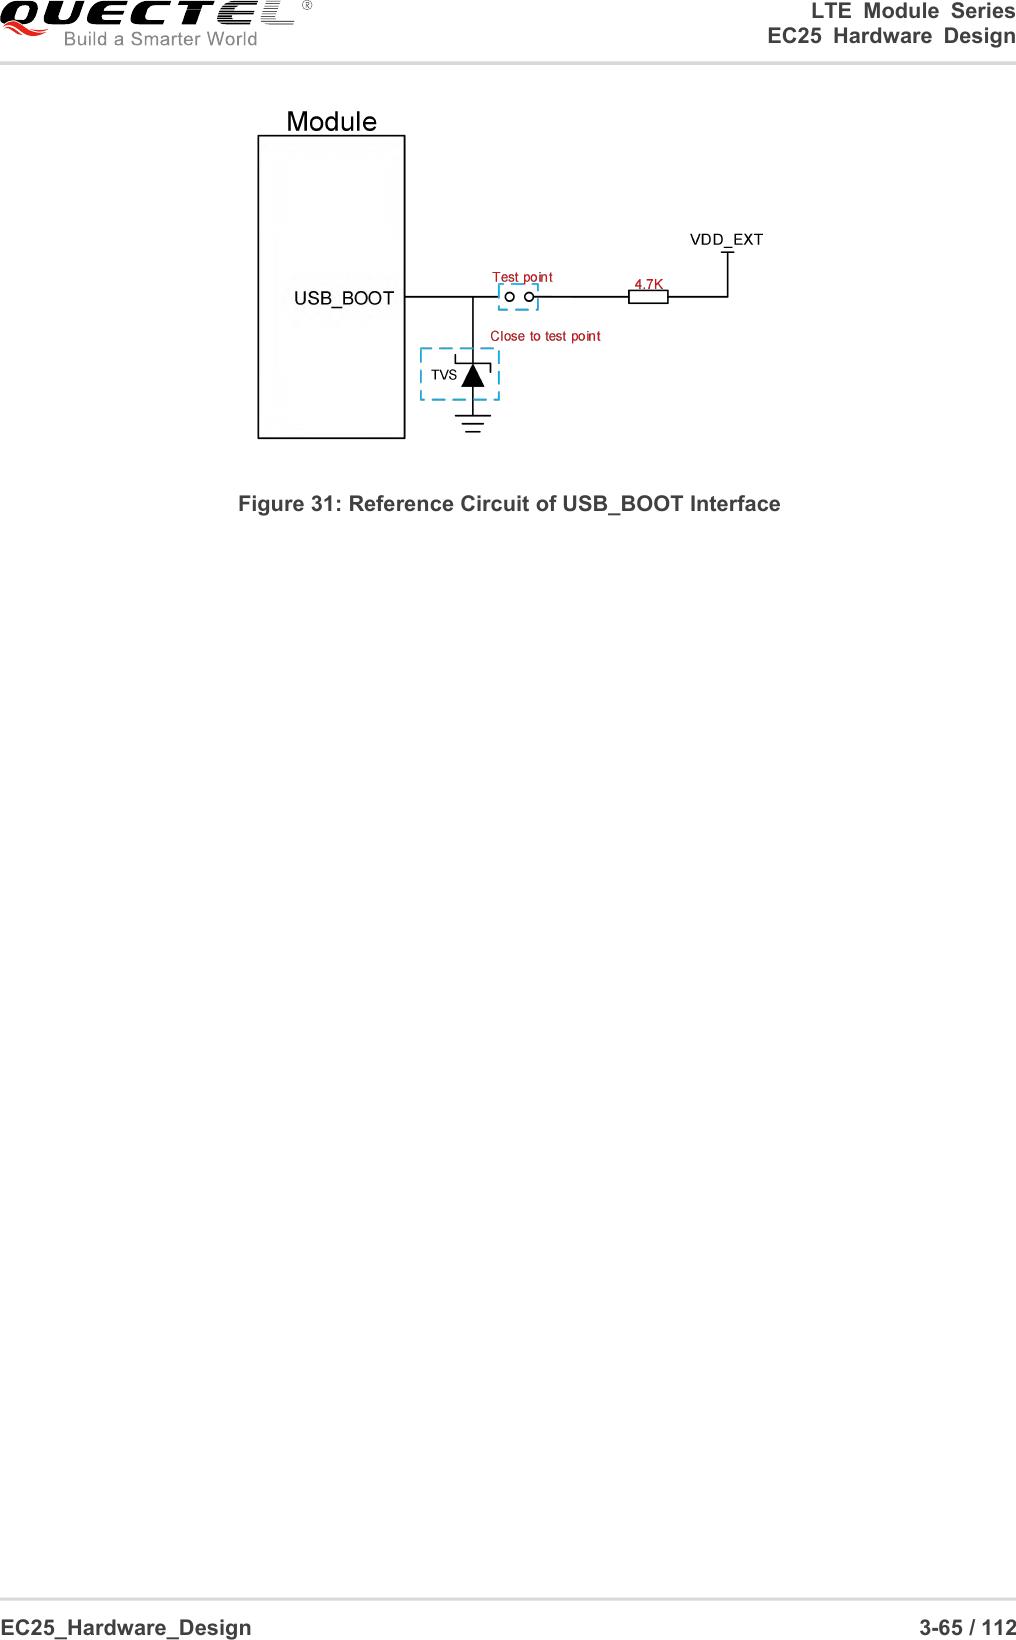 Quectel Wireless Solutions 201607EC25V LTE Module User Manual